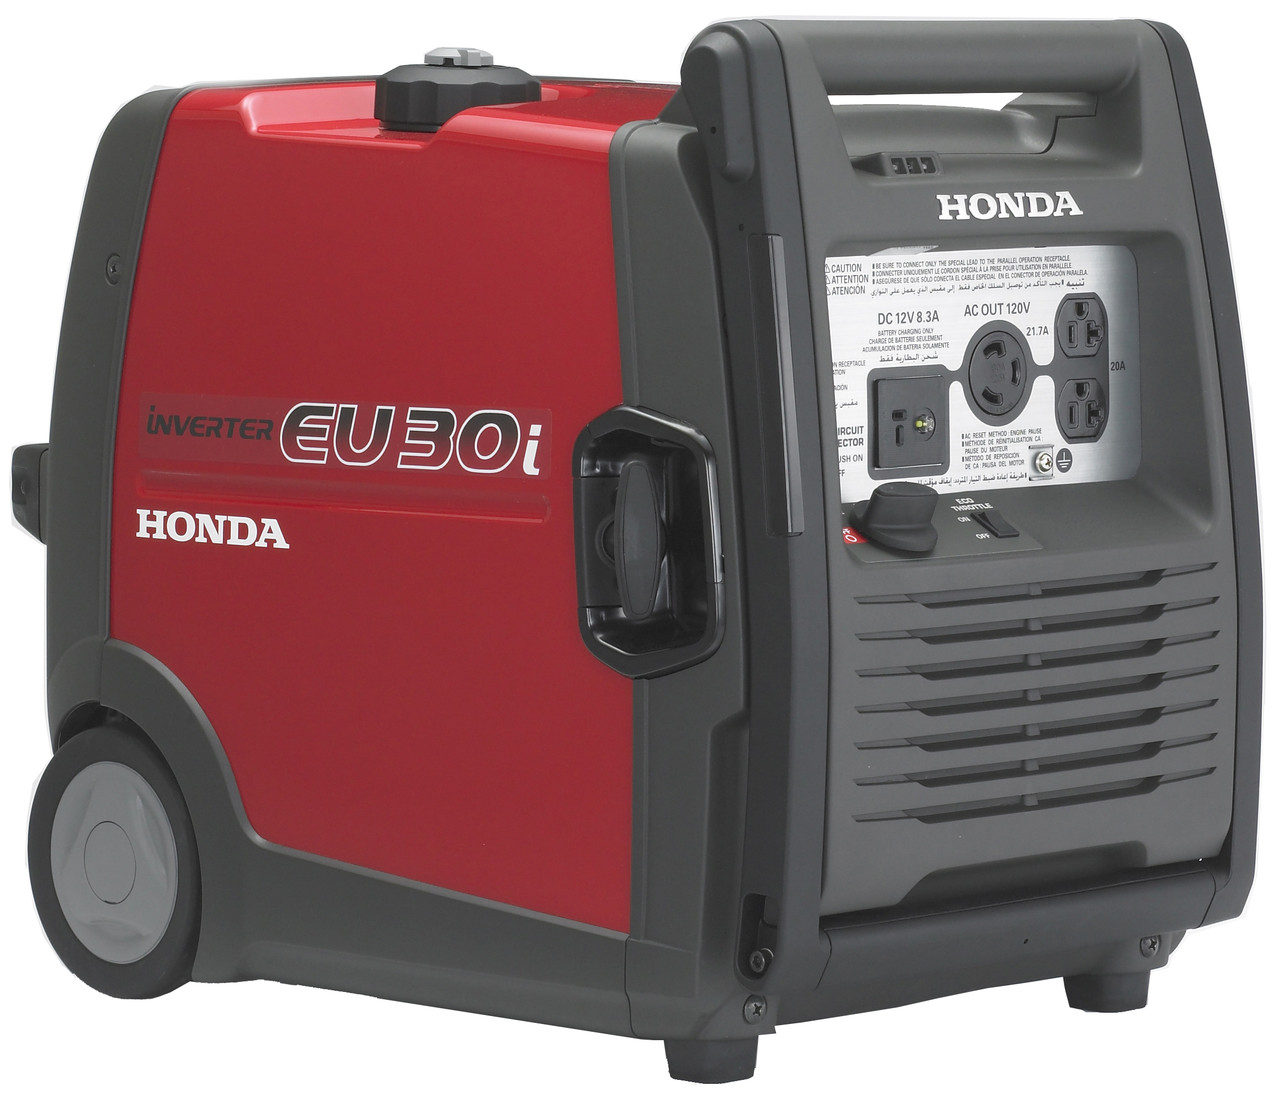 2 kva generator price in bangalore dating 6